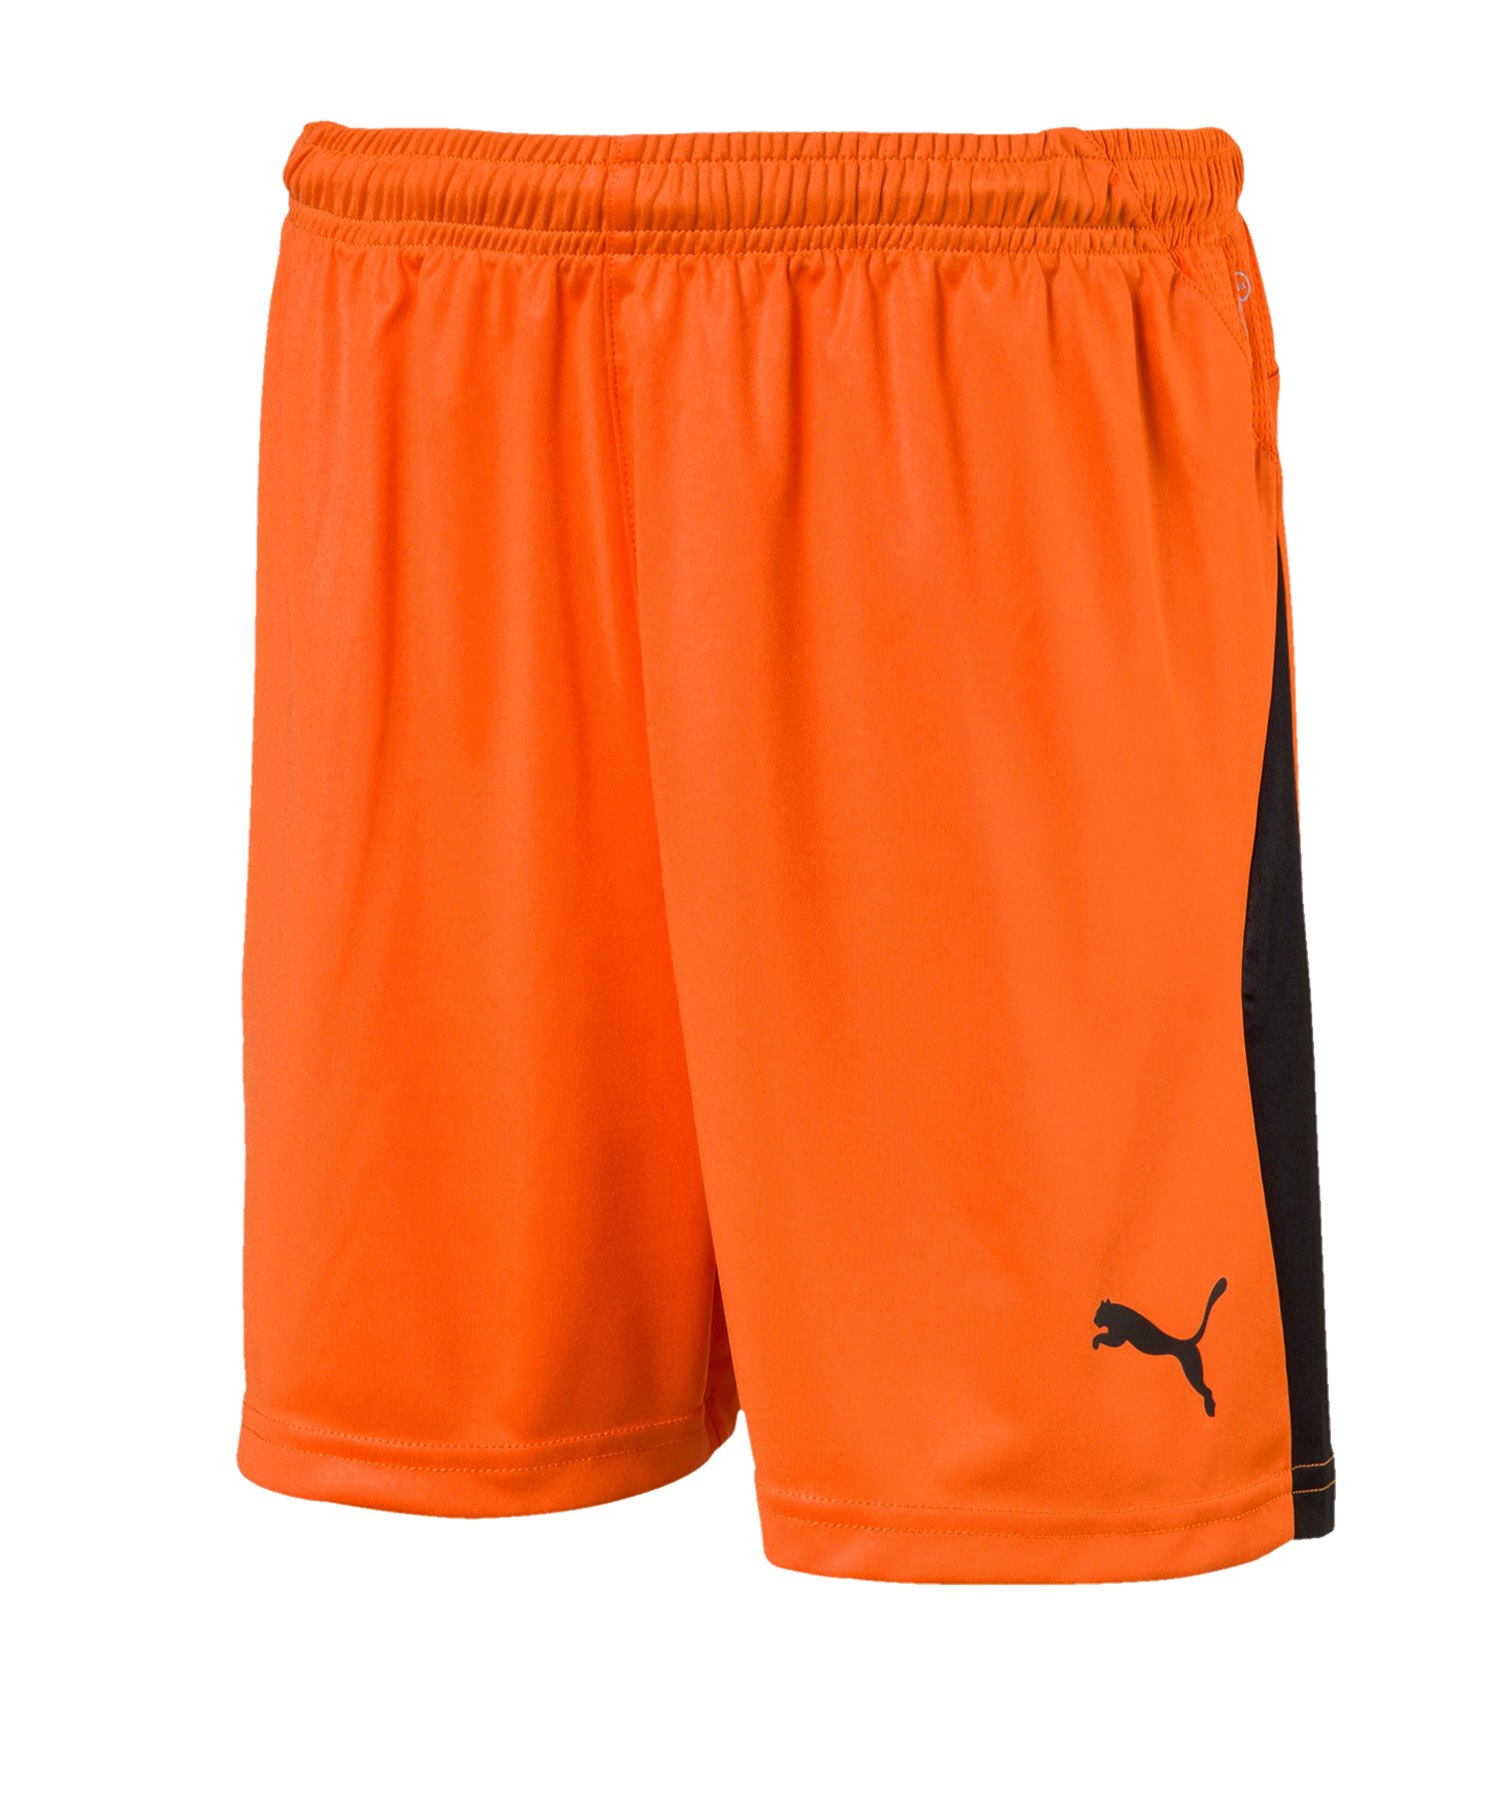 PUMA LIGA Short Kids Orange F08 - weiss